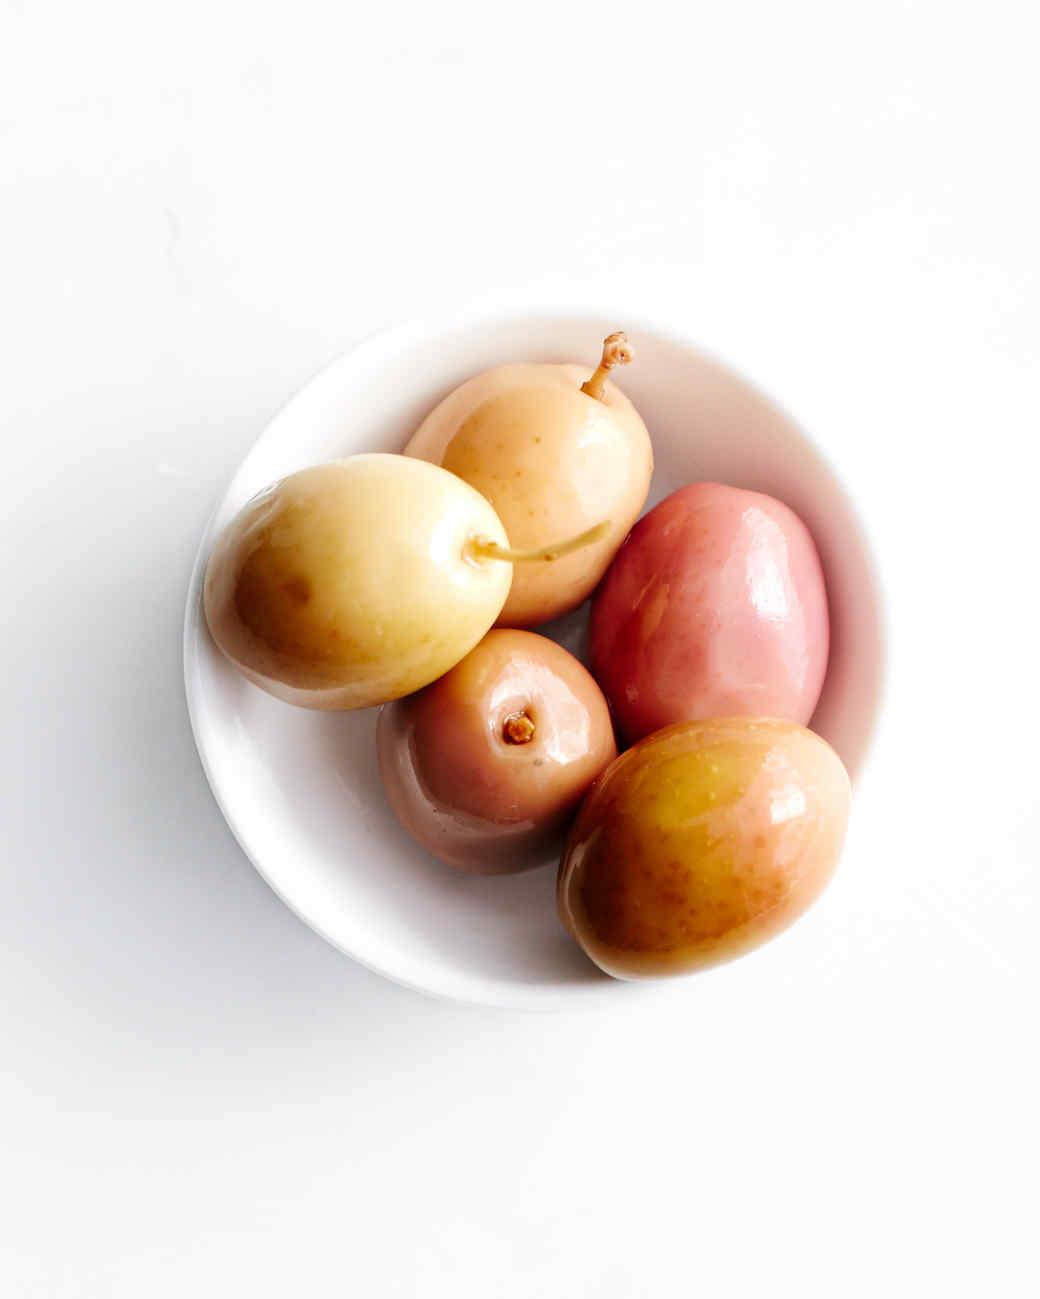 olive-ipad-domat-0105-ld110630-0614.jpg